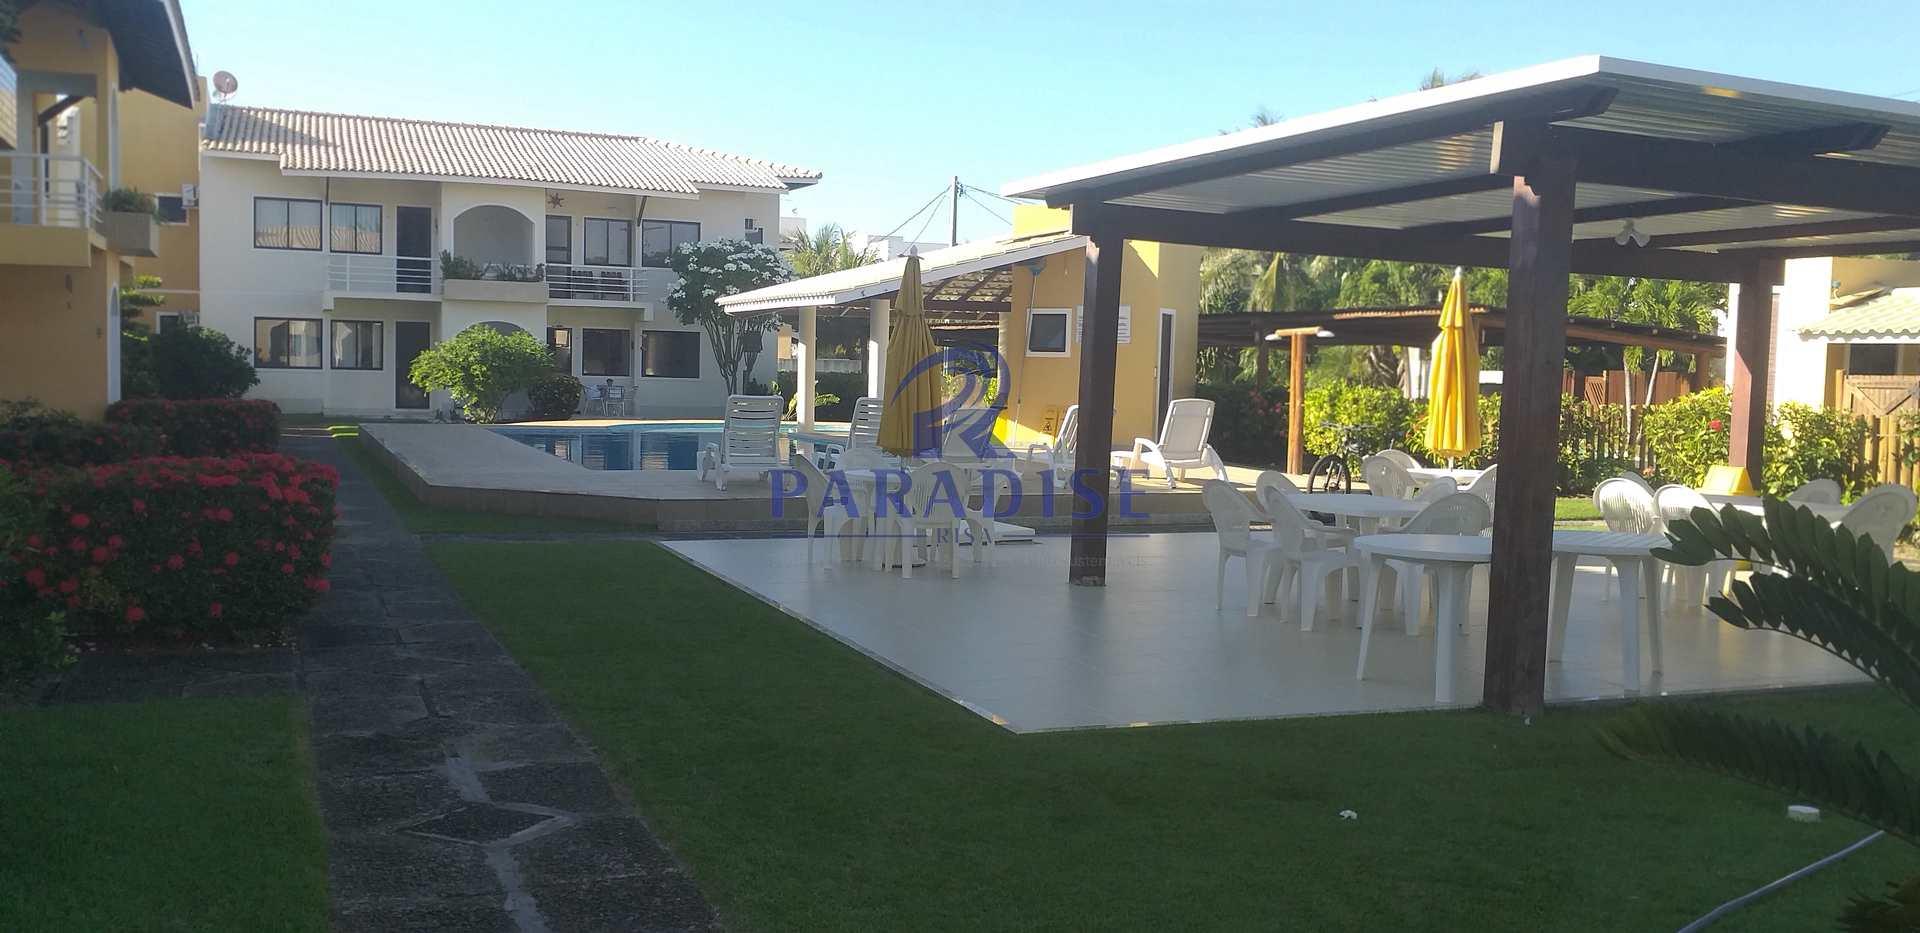 Apartamento com 2 dorms, Guarajuba, Guarajuba (Camaçari) - R$ 500 mil, Cod: 68409